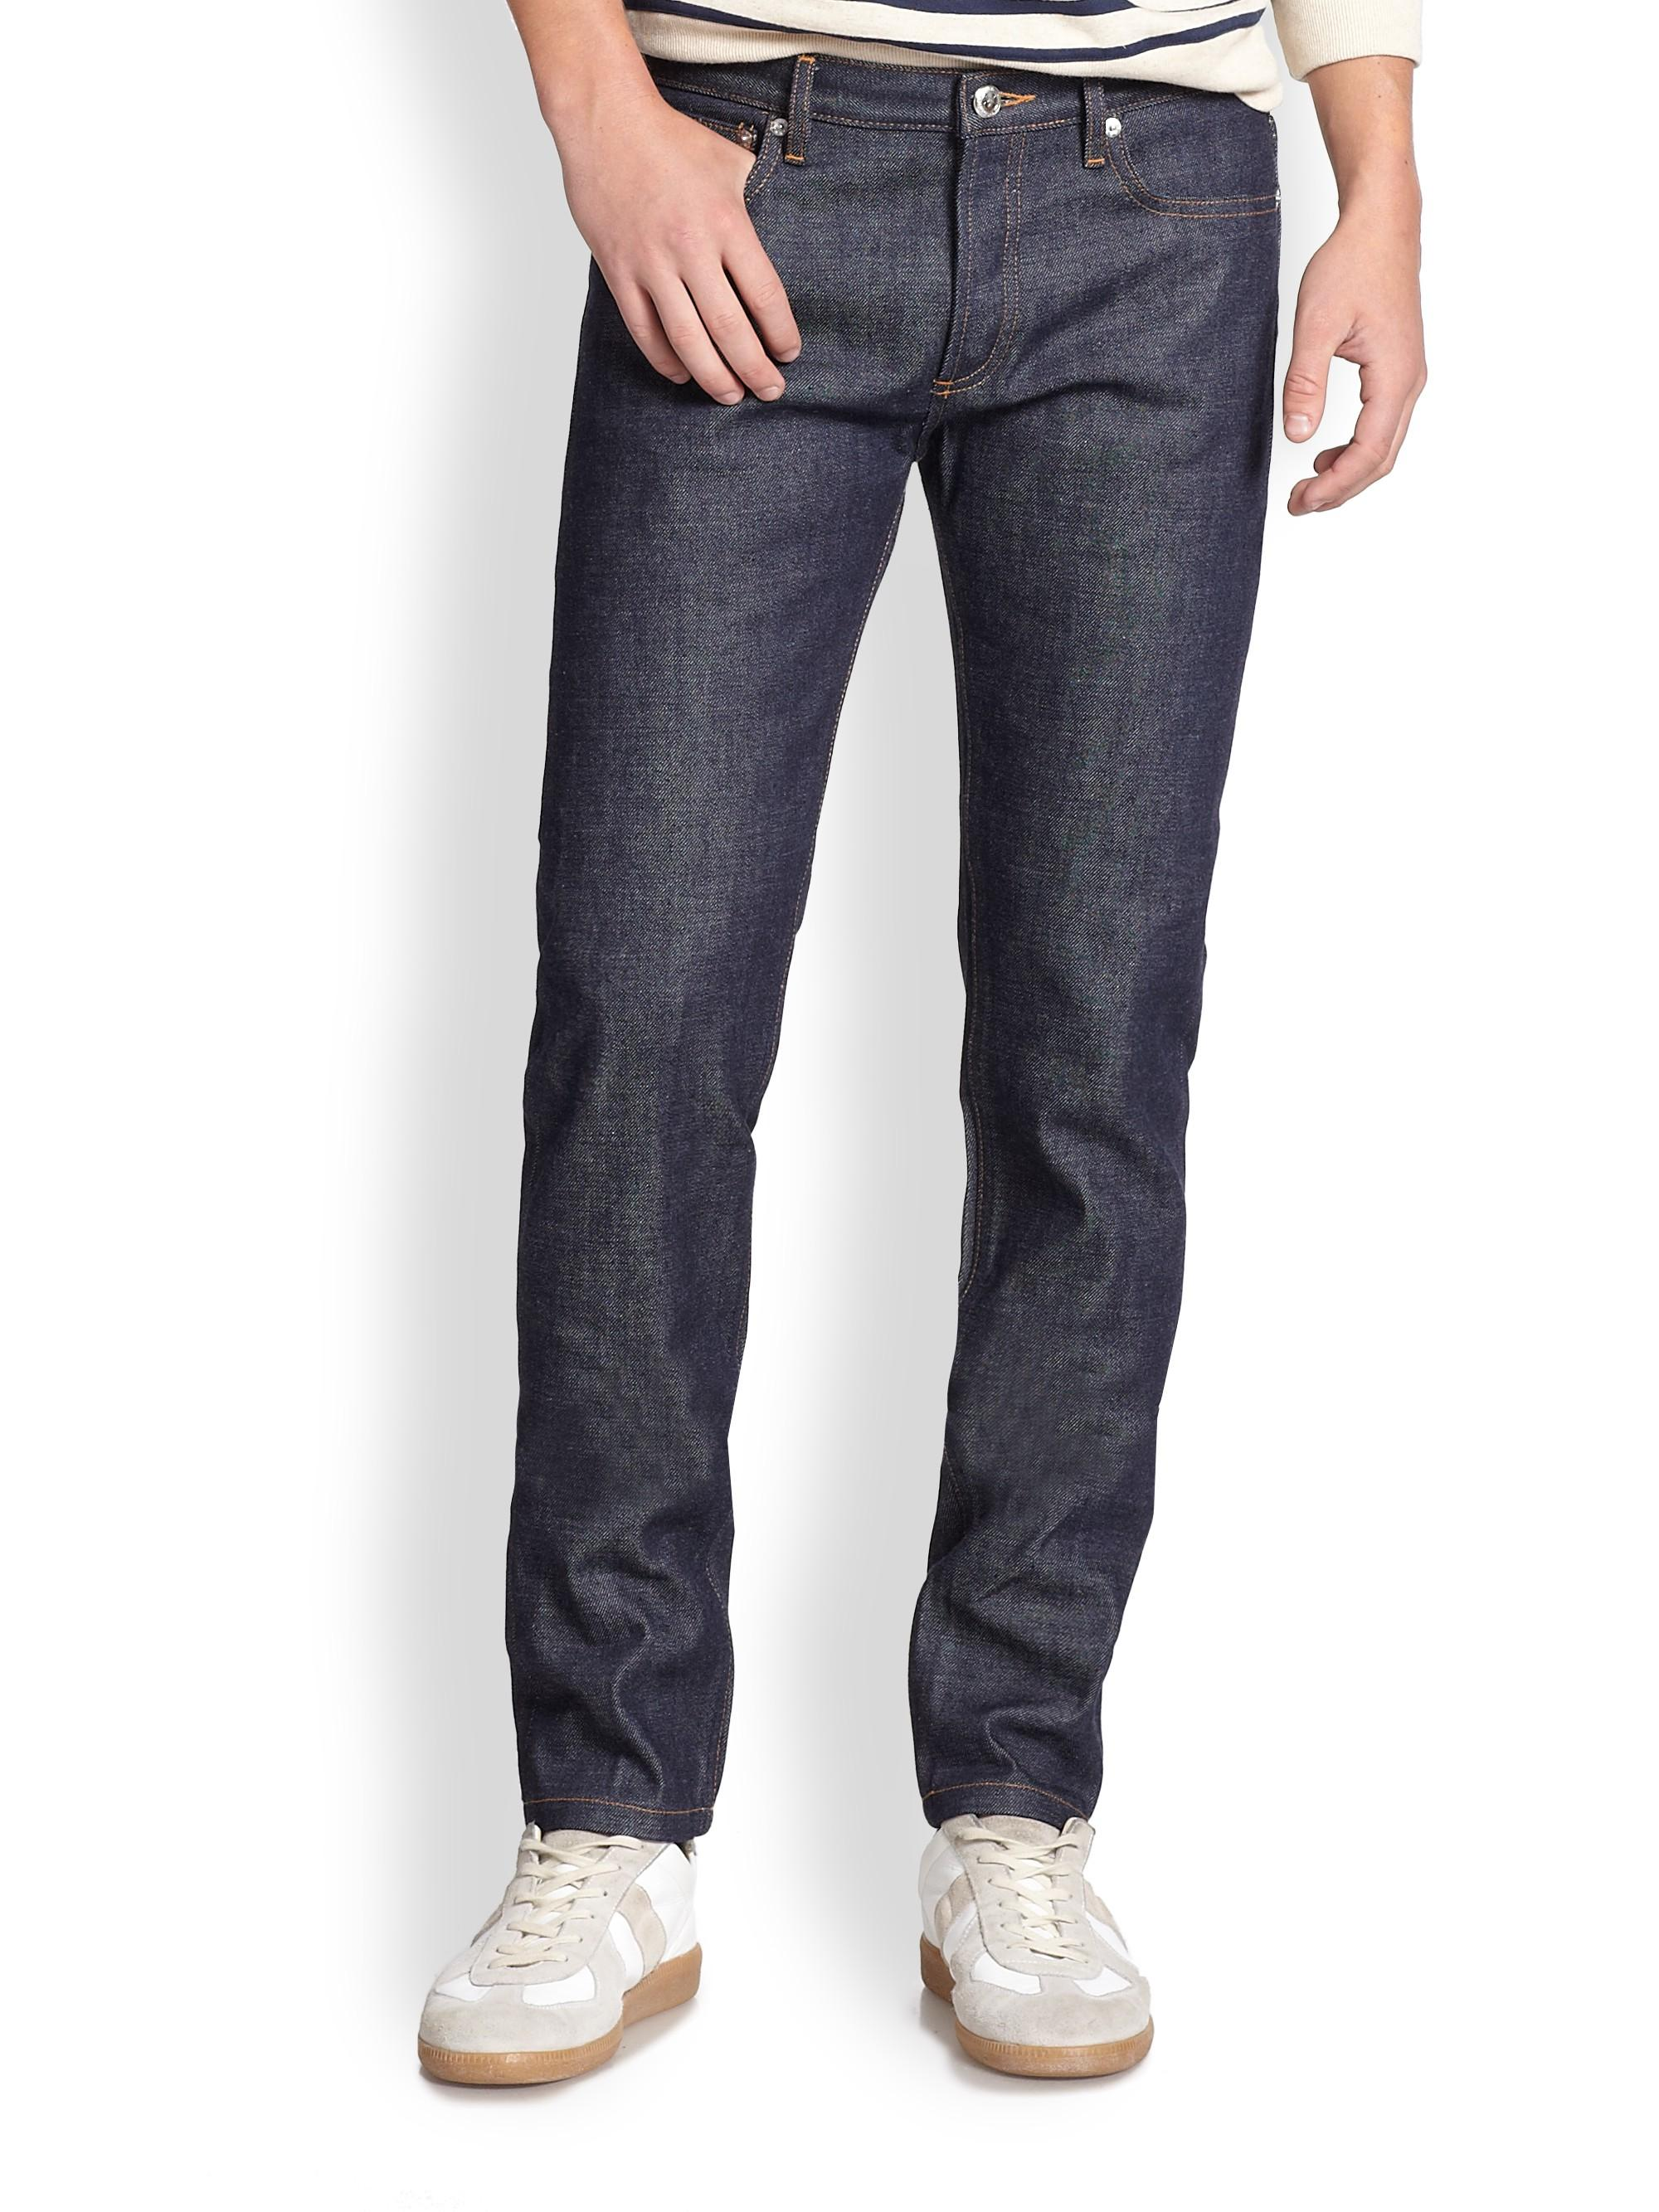 A.P.C. Petit New Standard Jeans In Indigo